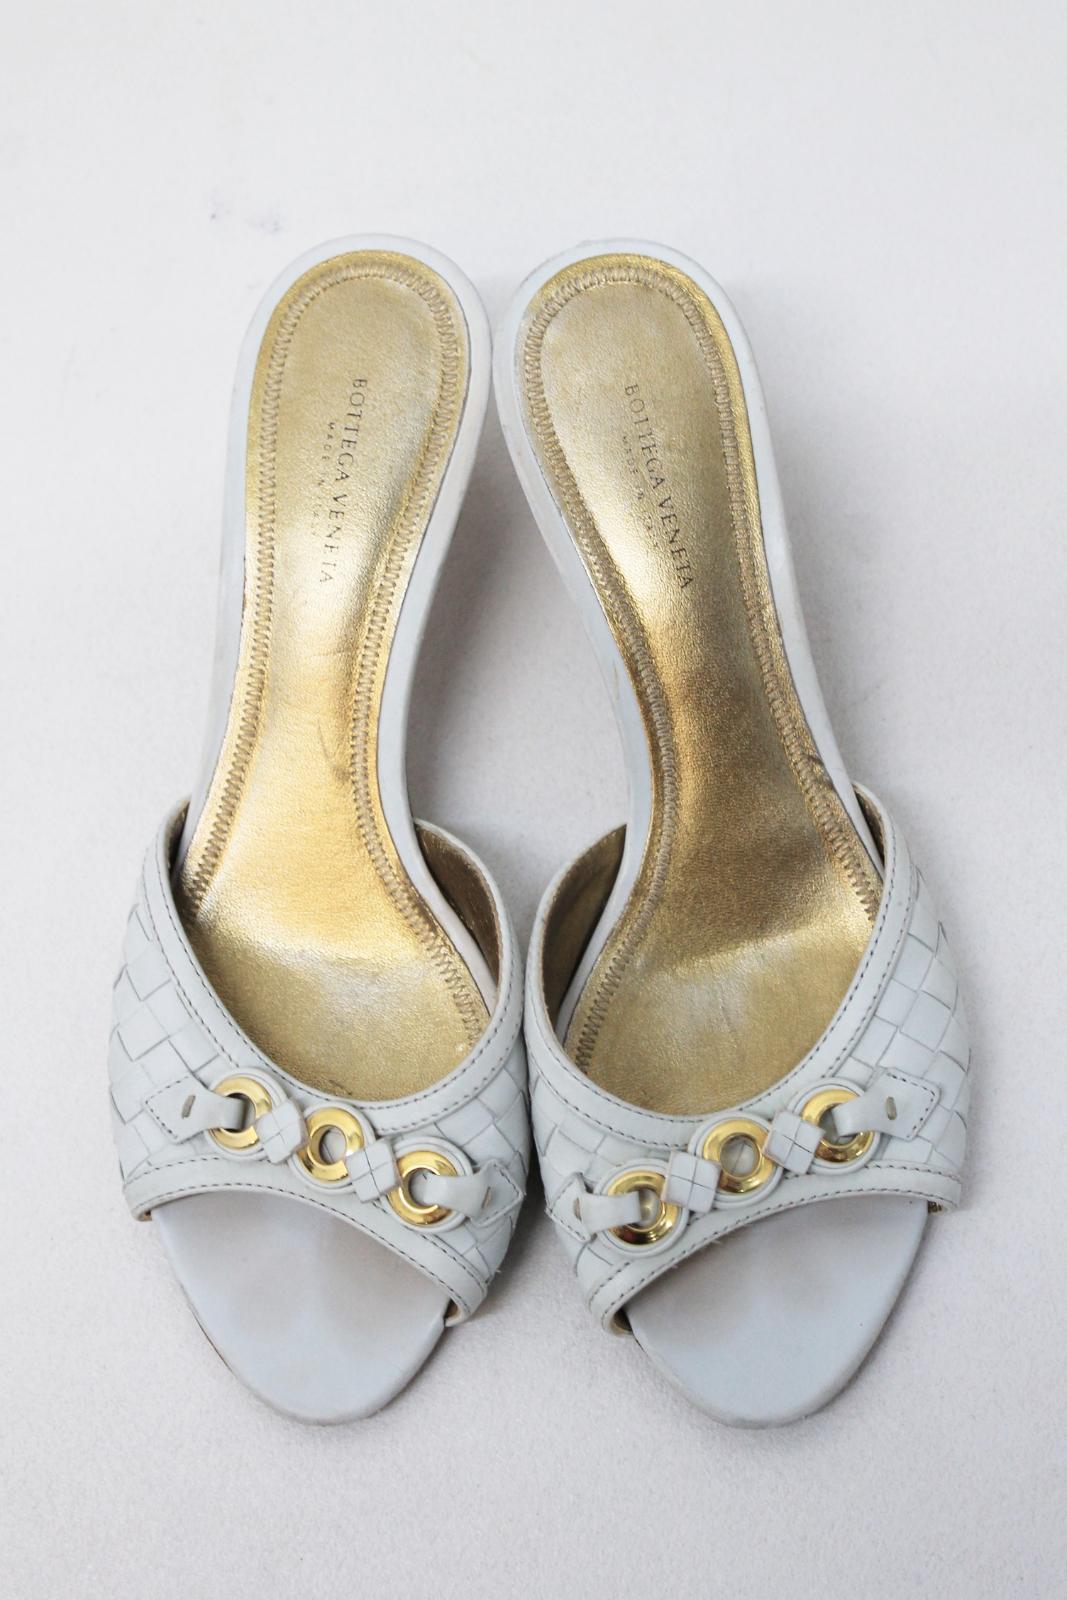 BOTTEGA VENETA Ladies White Leather Woven Mid Heeled Sandals shoes shoes shoes EU38.5 UK5.5 9460c8